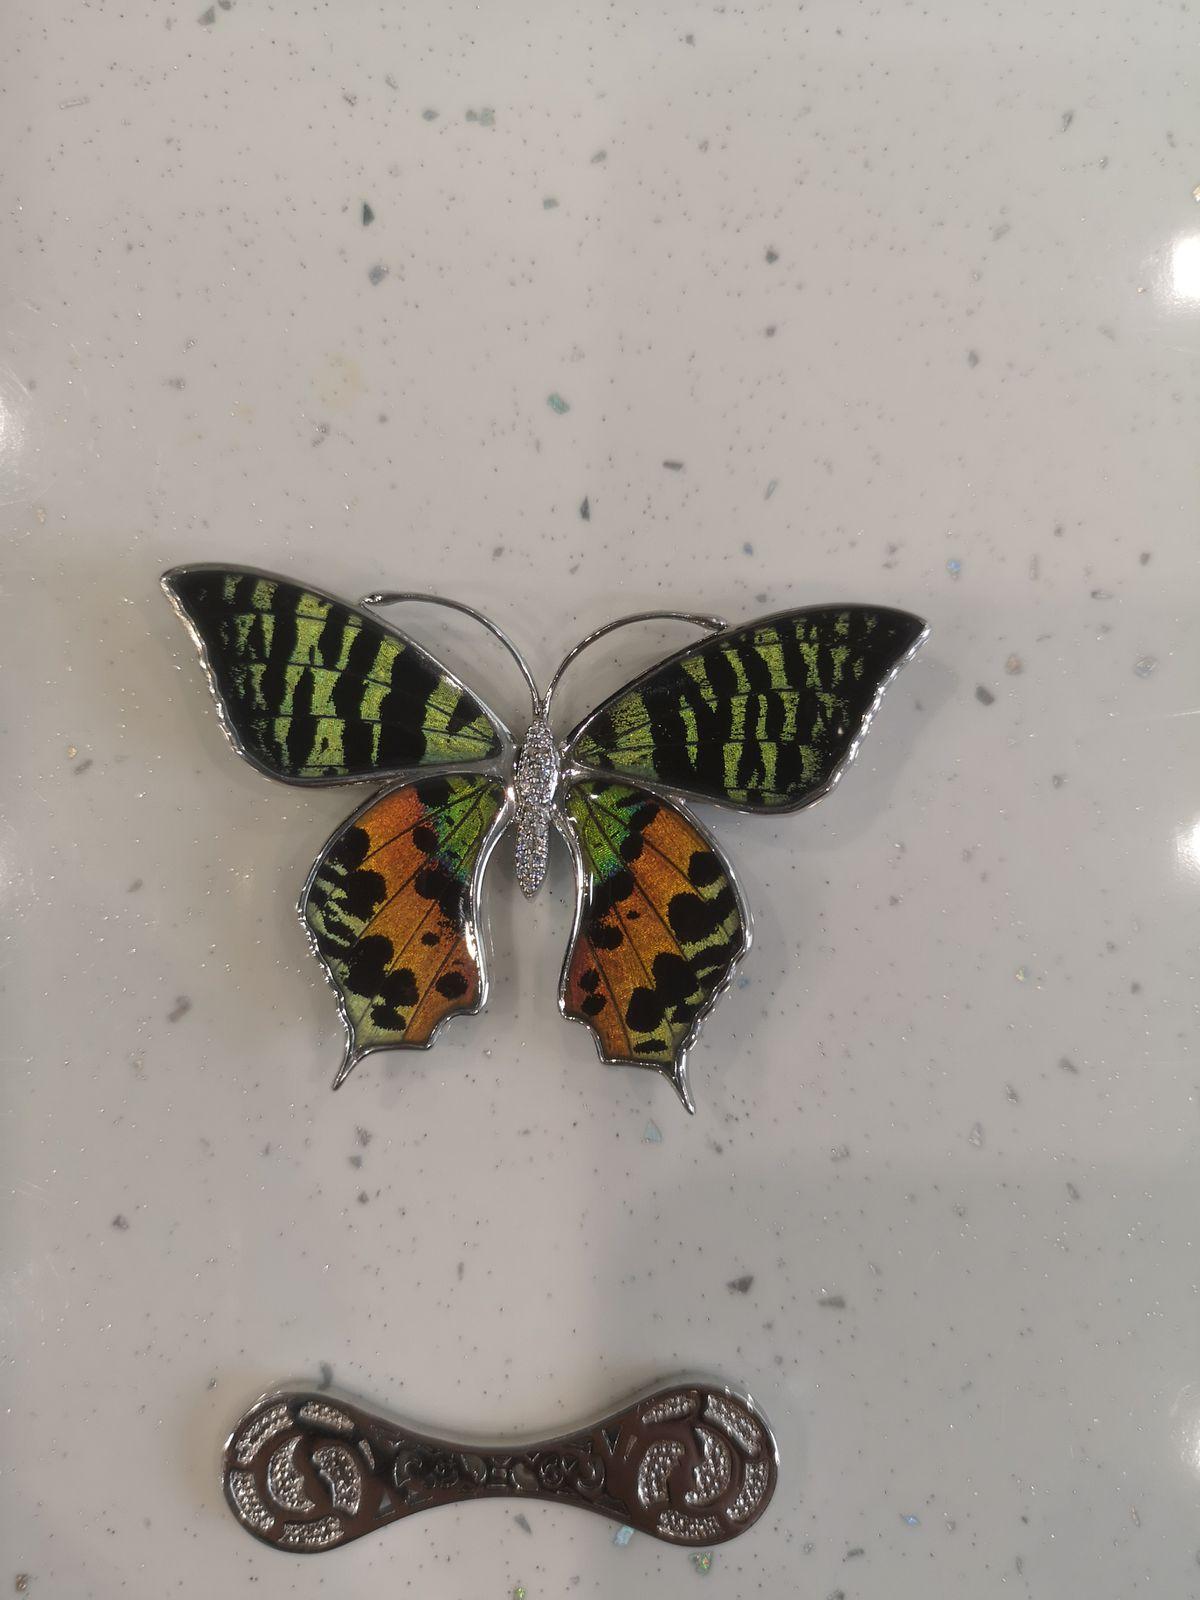 Нереально красивая бабочка махаон